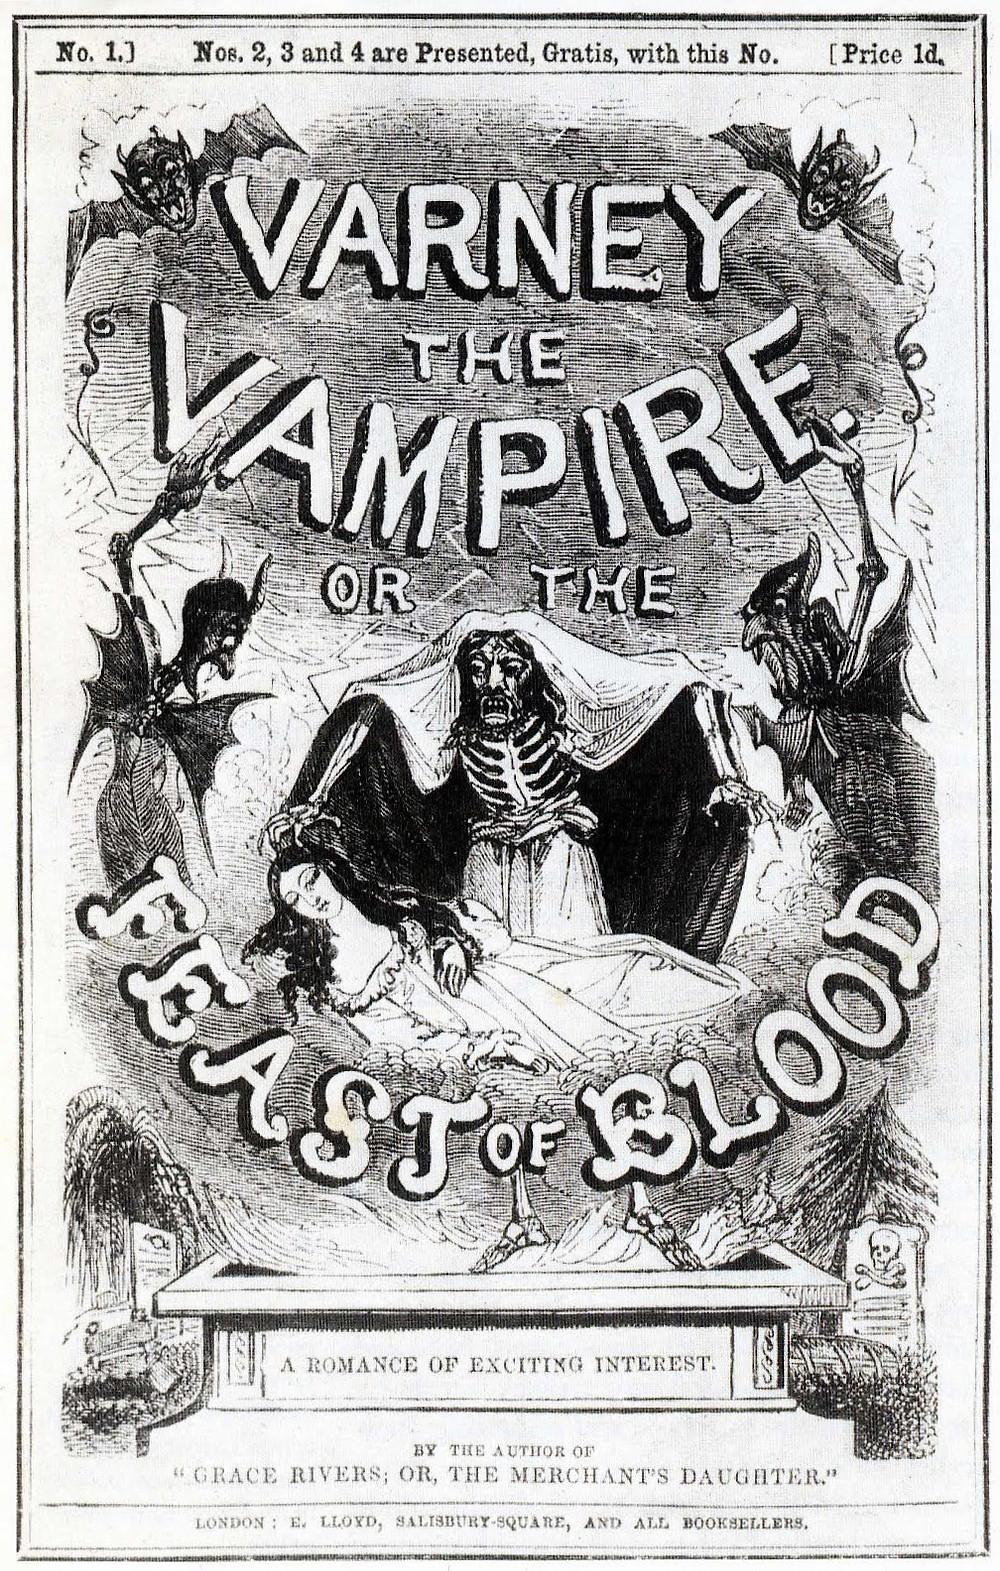 Varney the Vampire; or, the Feast of Blood - OKYPUS bookshop - ΩΚΥΠΟΥΣ βιβλιοπωλείο